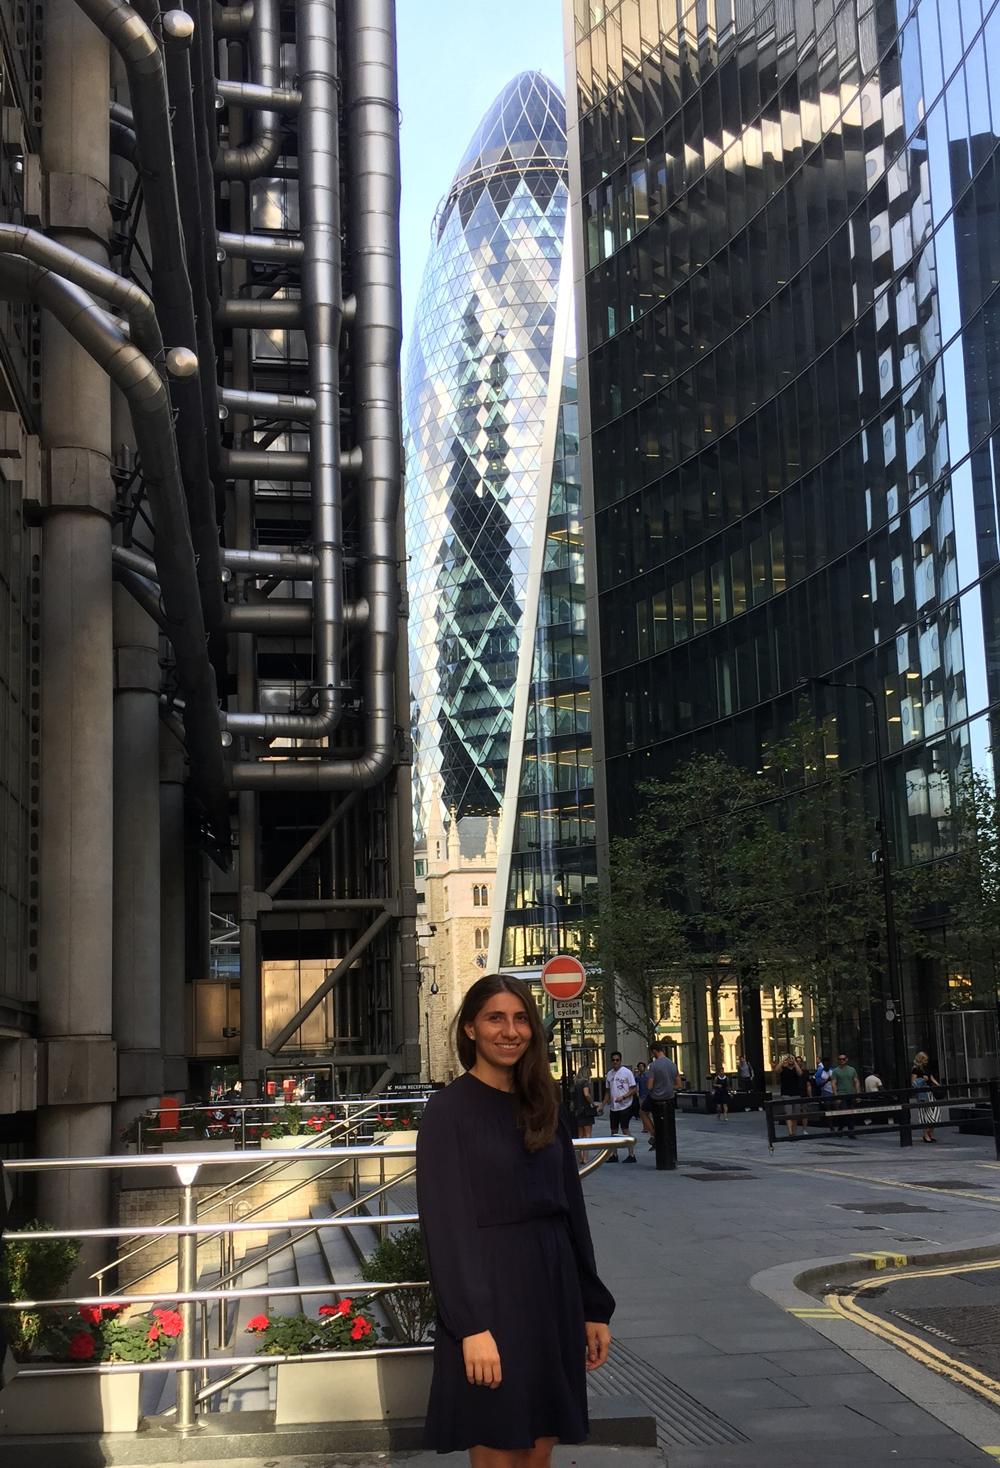 Lili Dopidze in the City of London